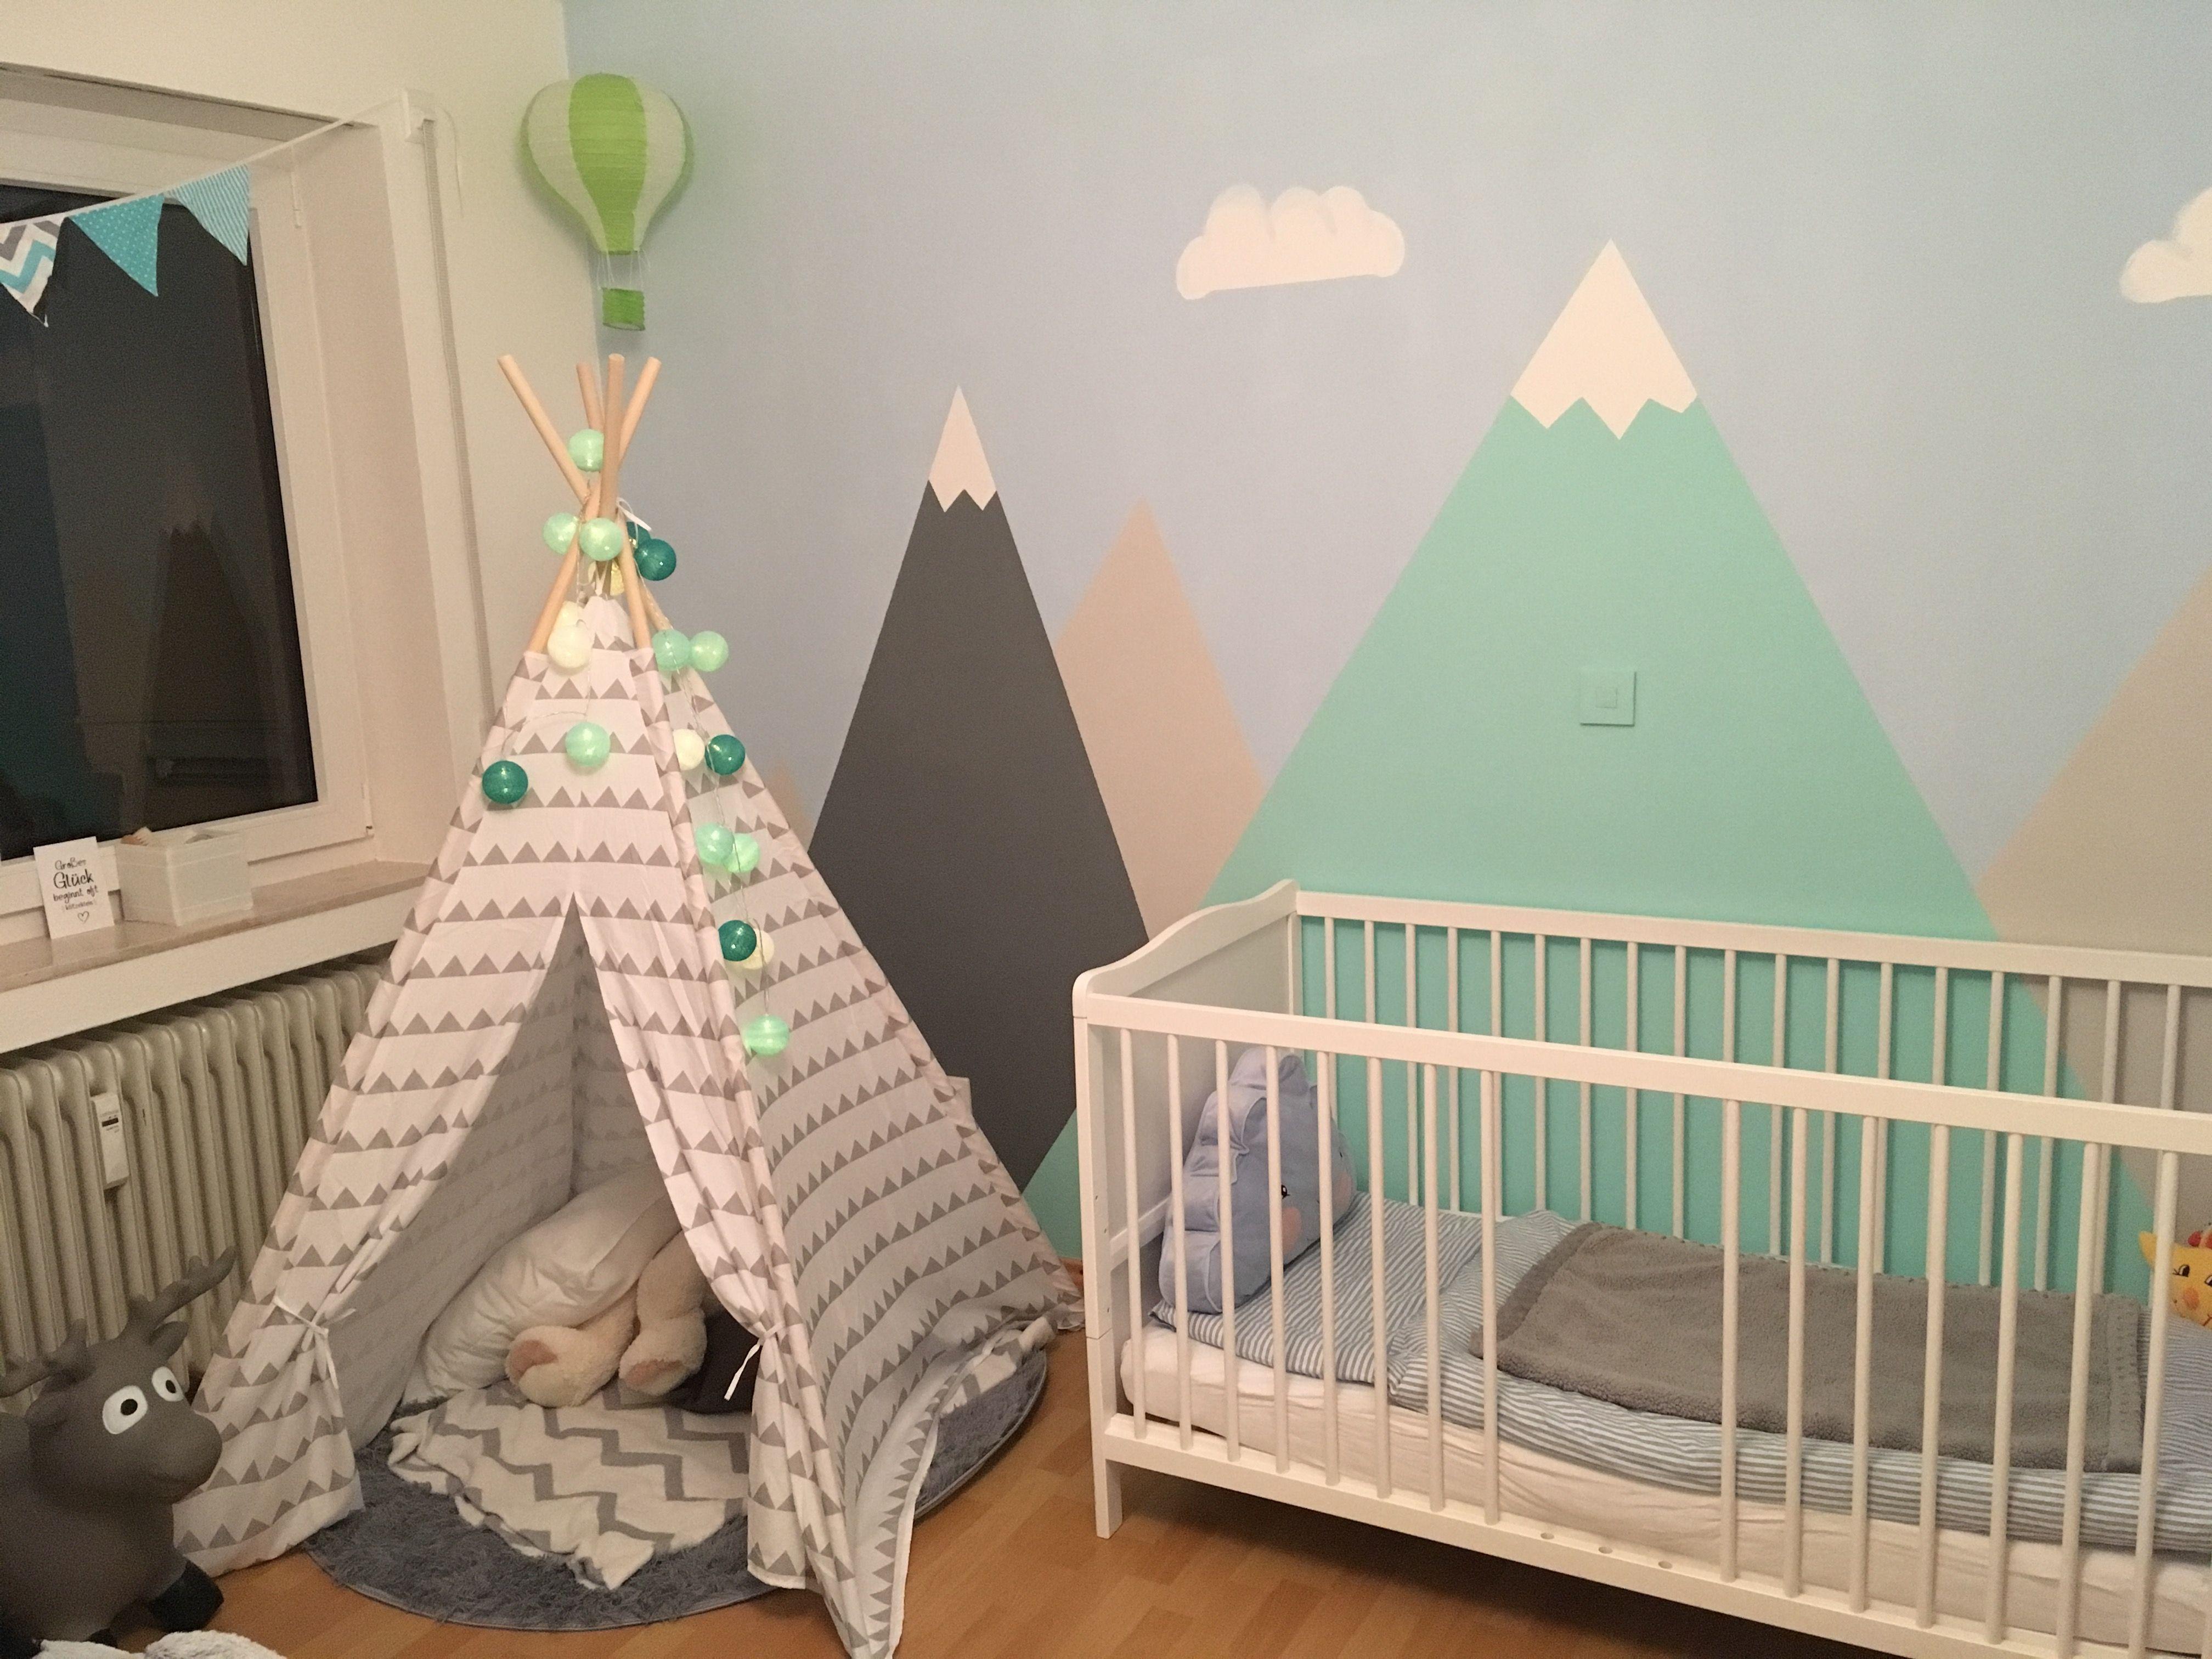 Kinderzimmer Junge Berge Mountains Heißluftballon Tipi